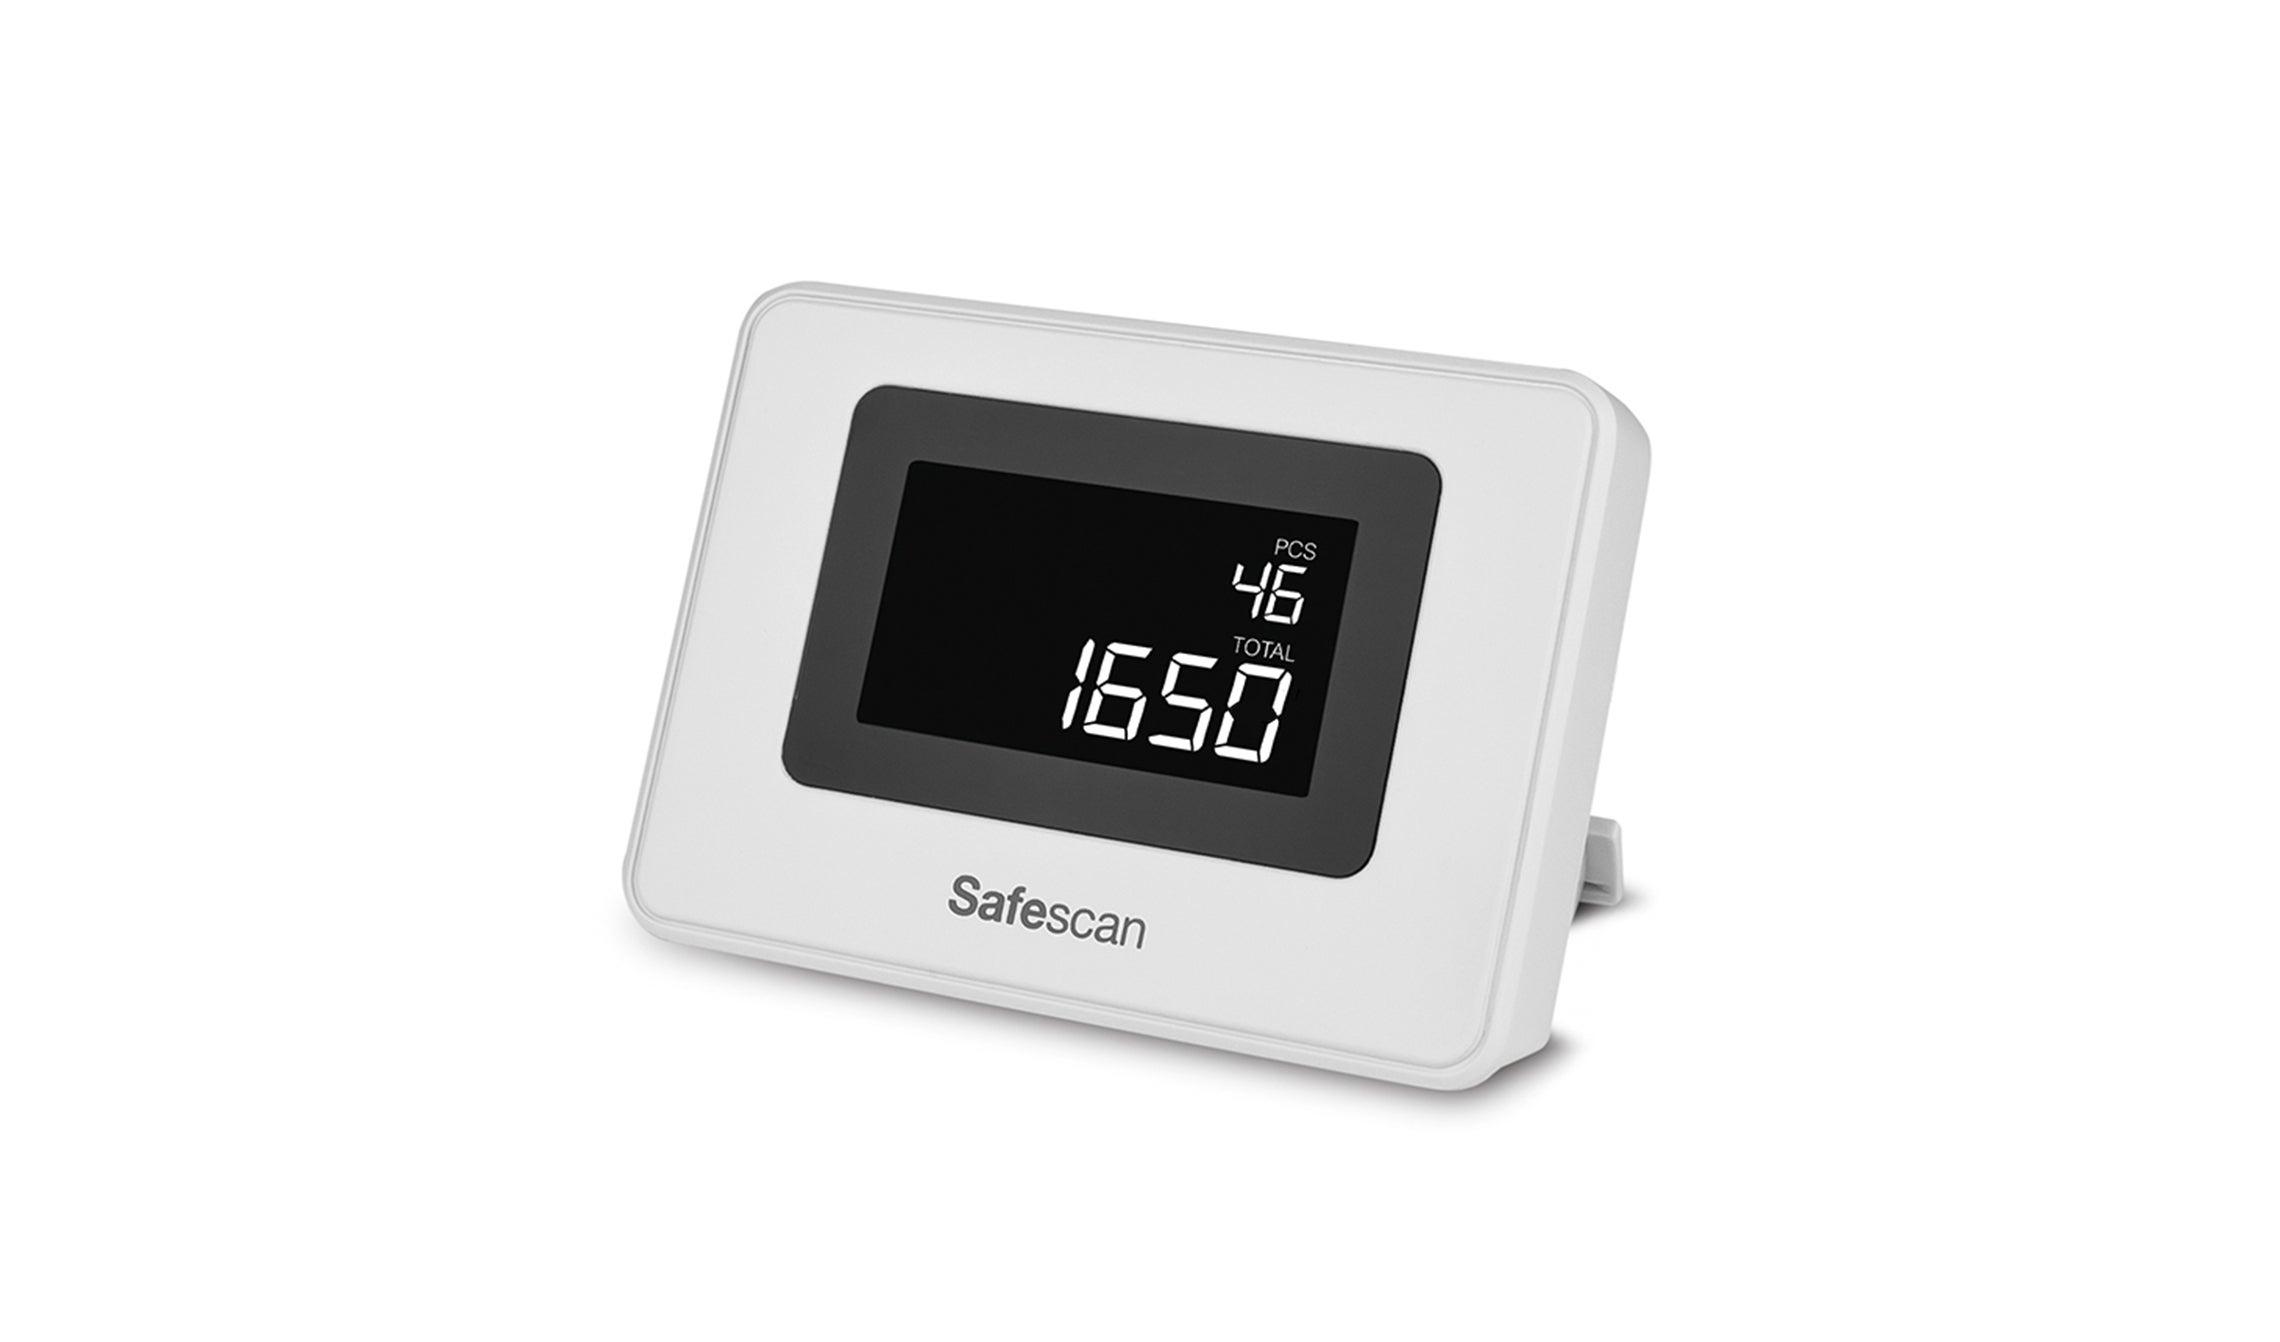 safescan-ed-150-external-display